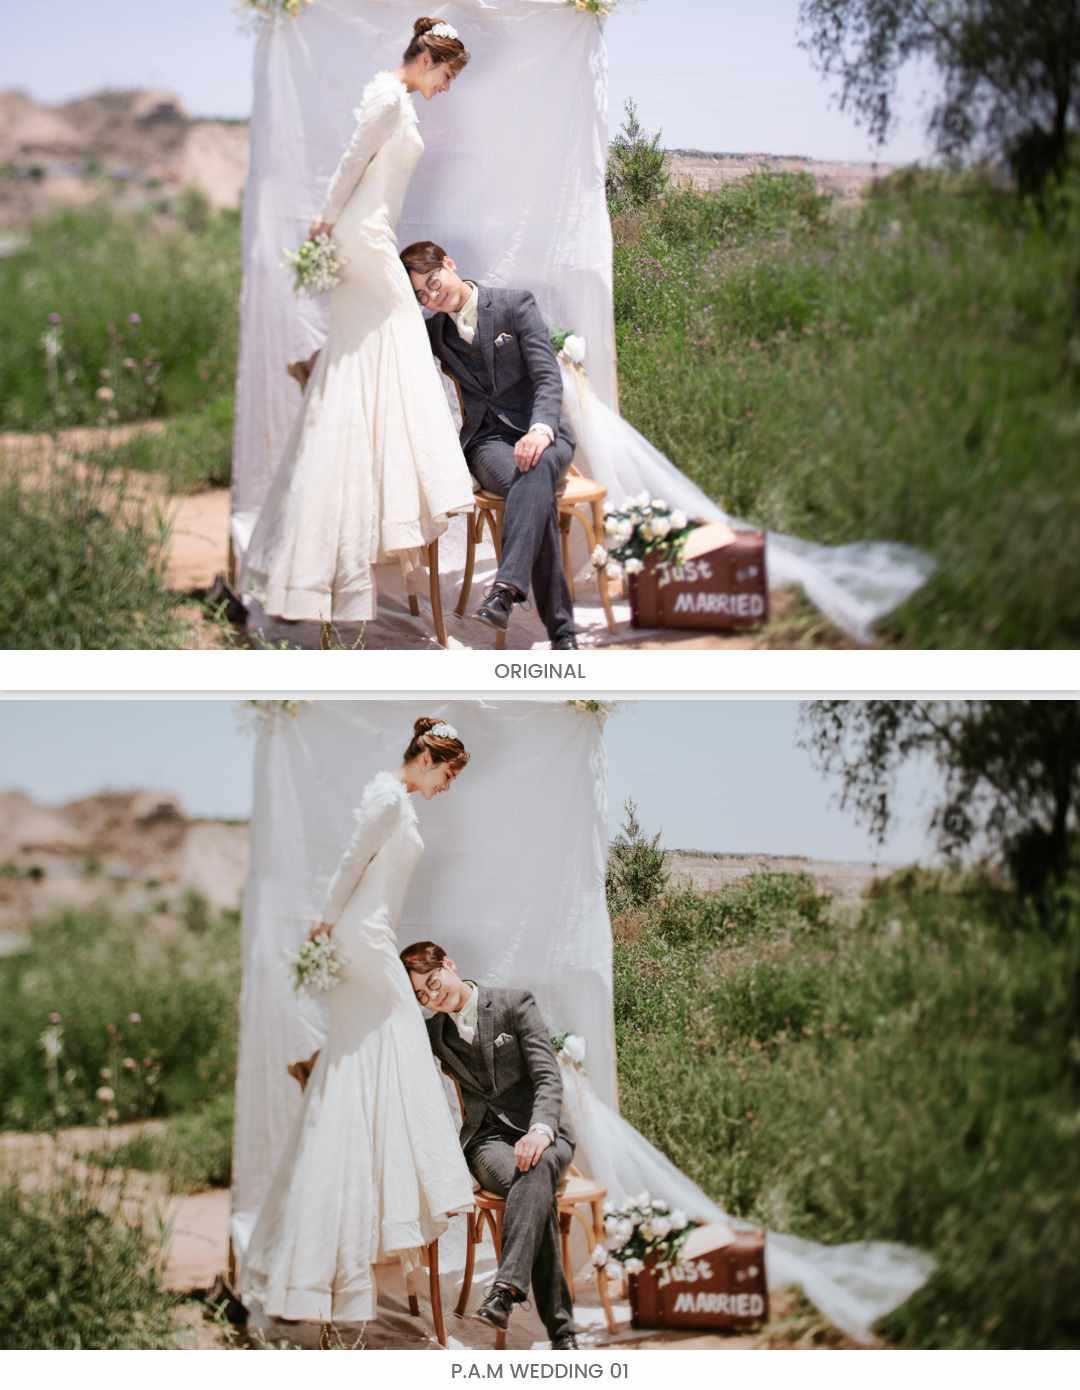 P.A.M WEDDING